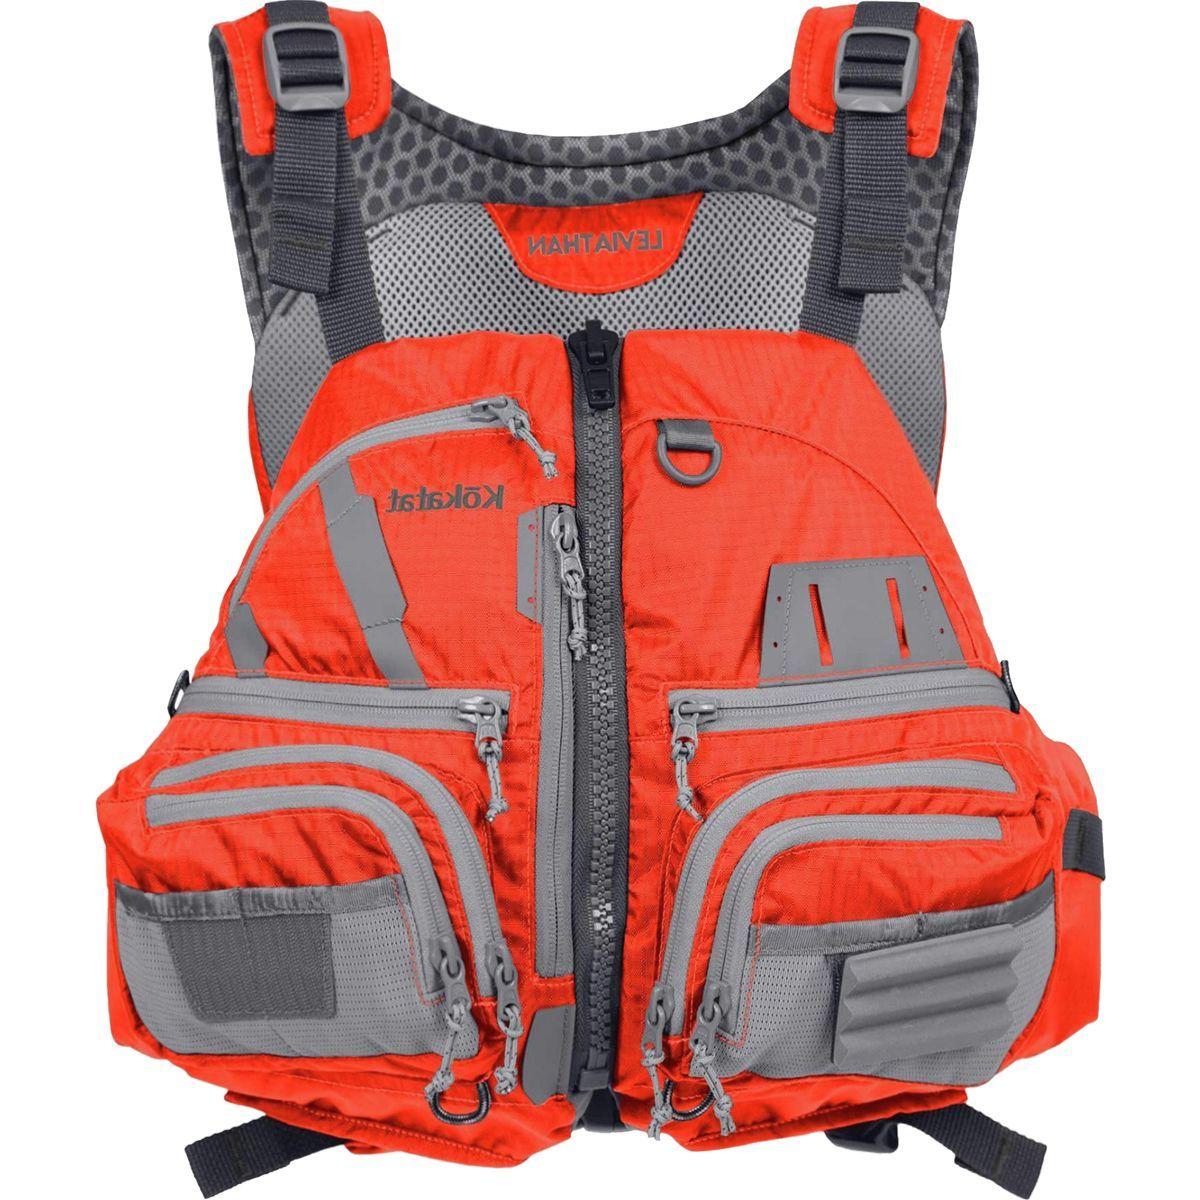 Kokatat Leviathan Personal Flotation Device - Men's